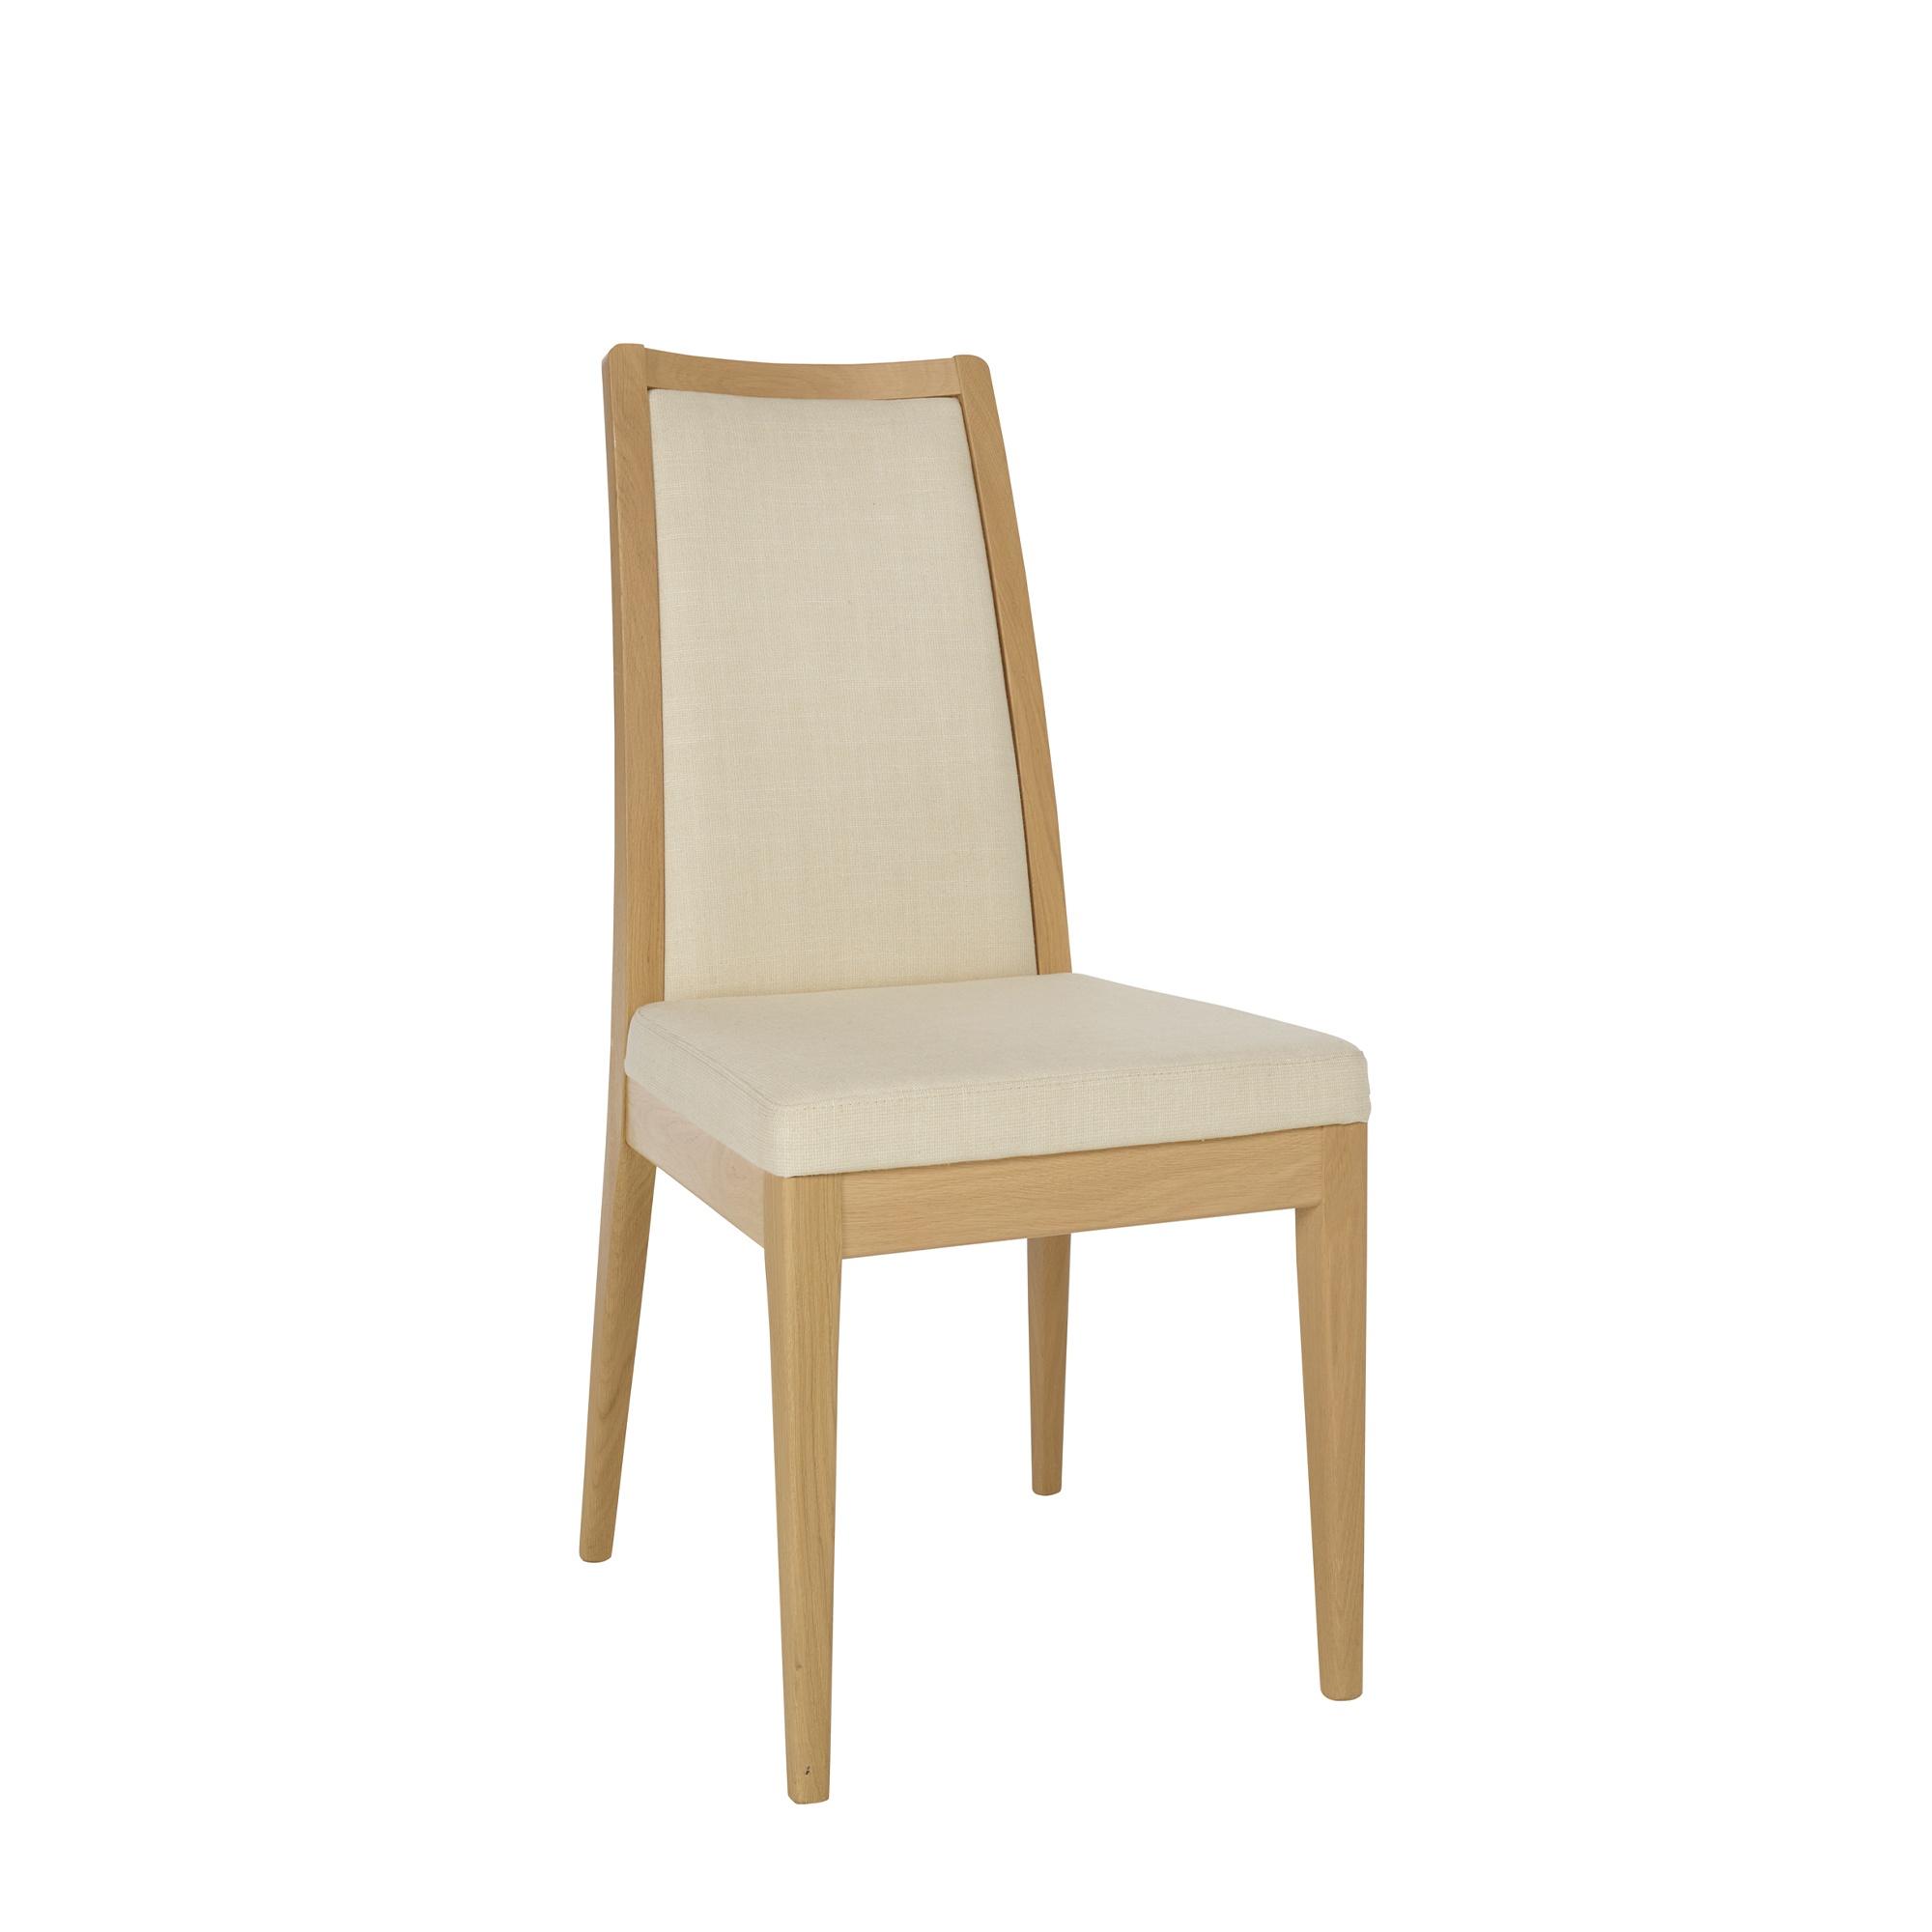 Ercol Romana Padded Back Dining Chair Ercol